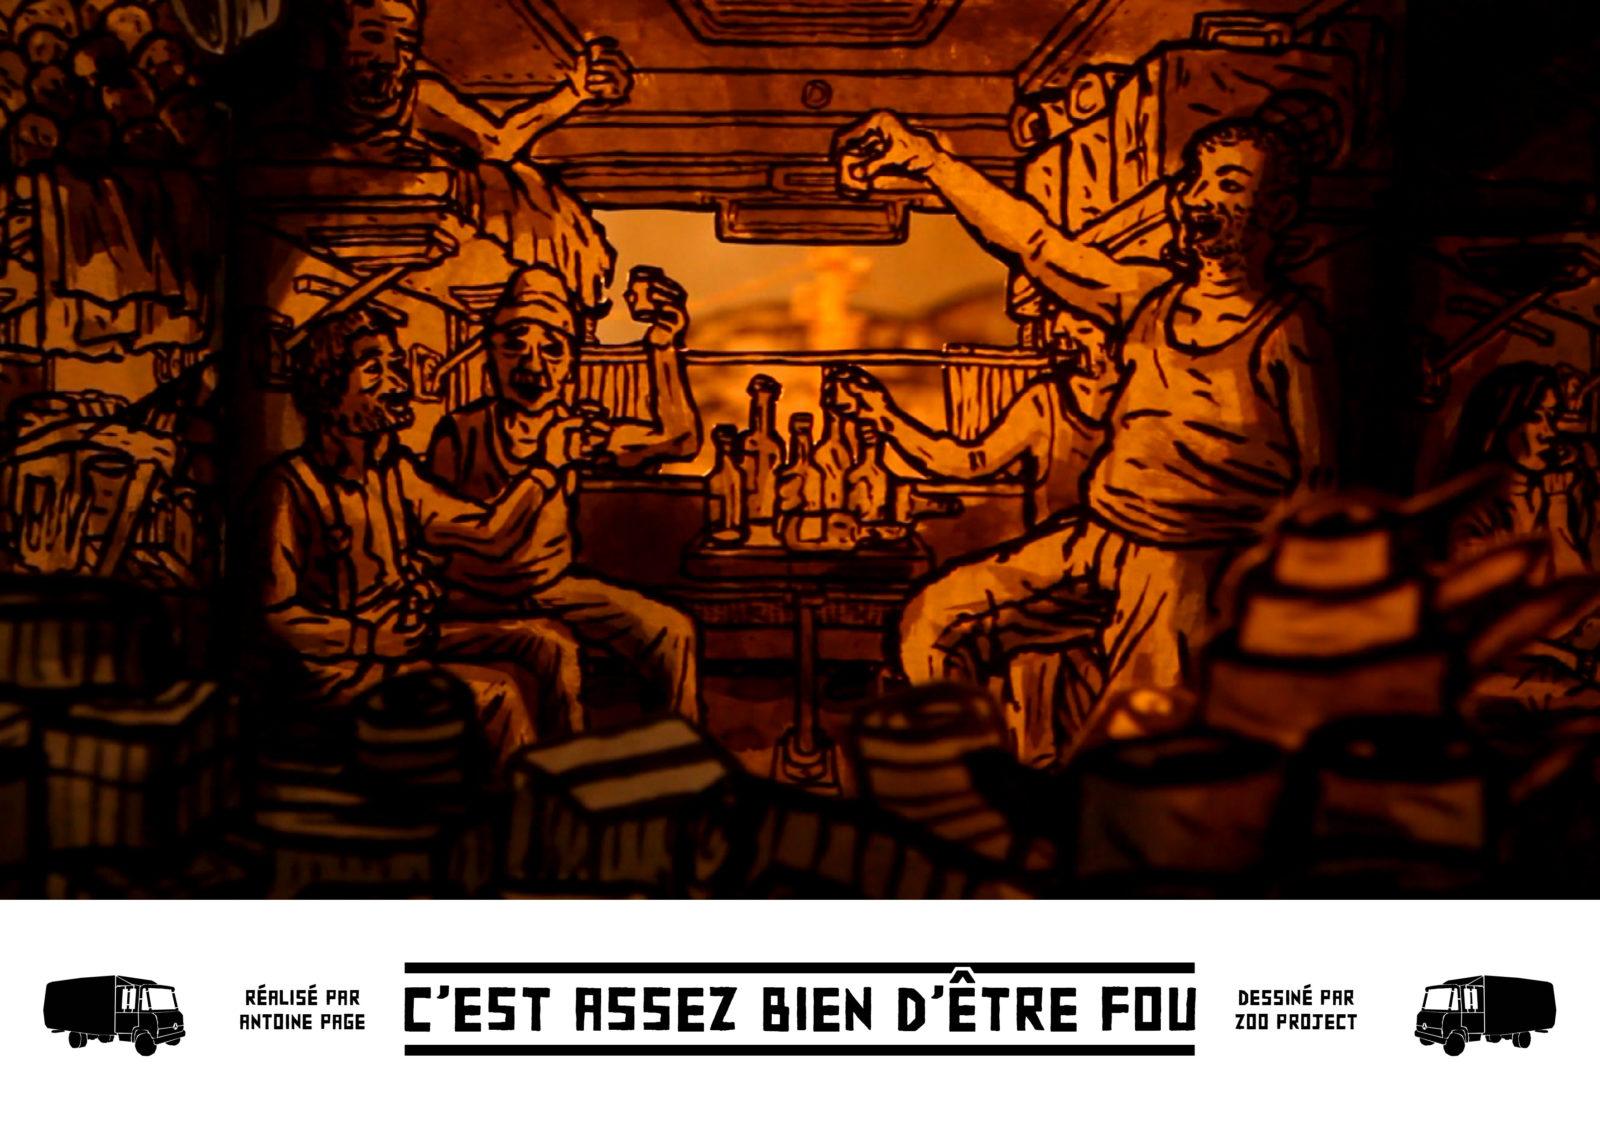 antoine page zoo project hommage - Le documentaire-hommage au street artiste Zoo Project enfin au cinéma